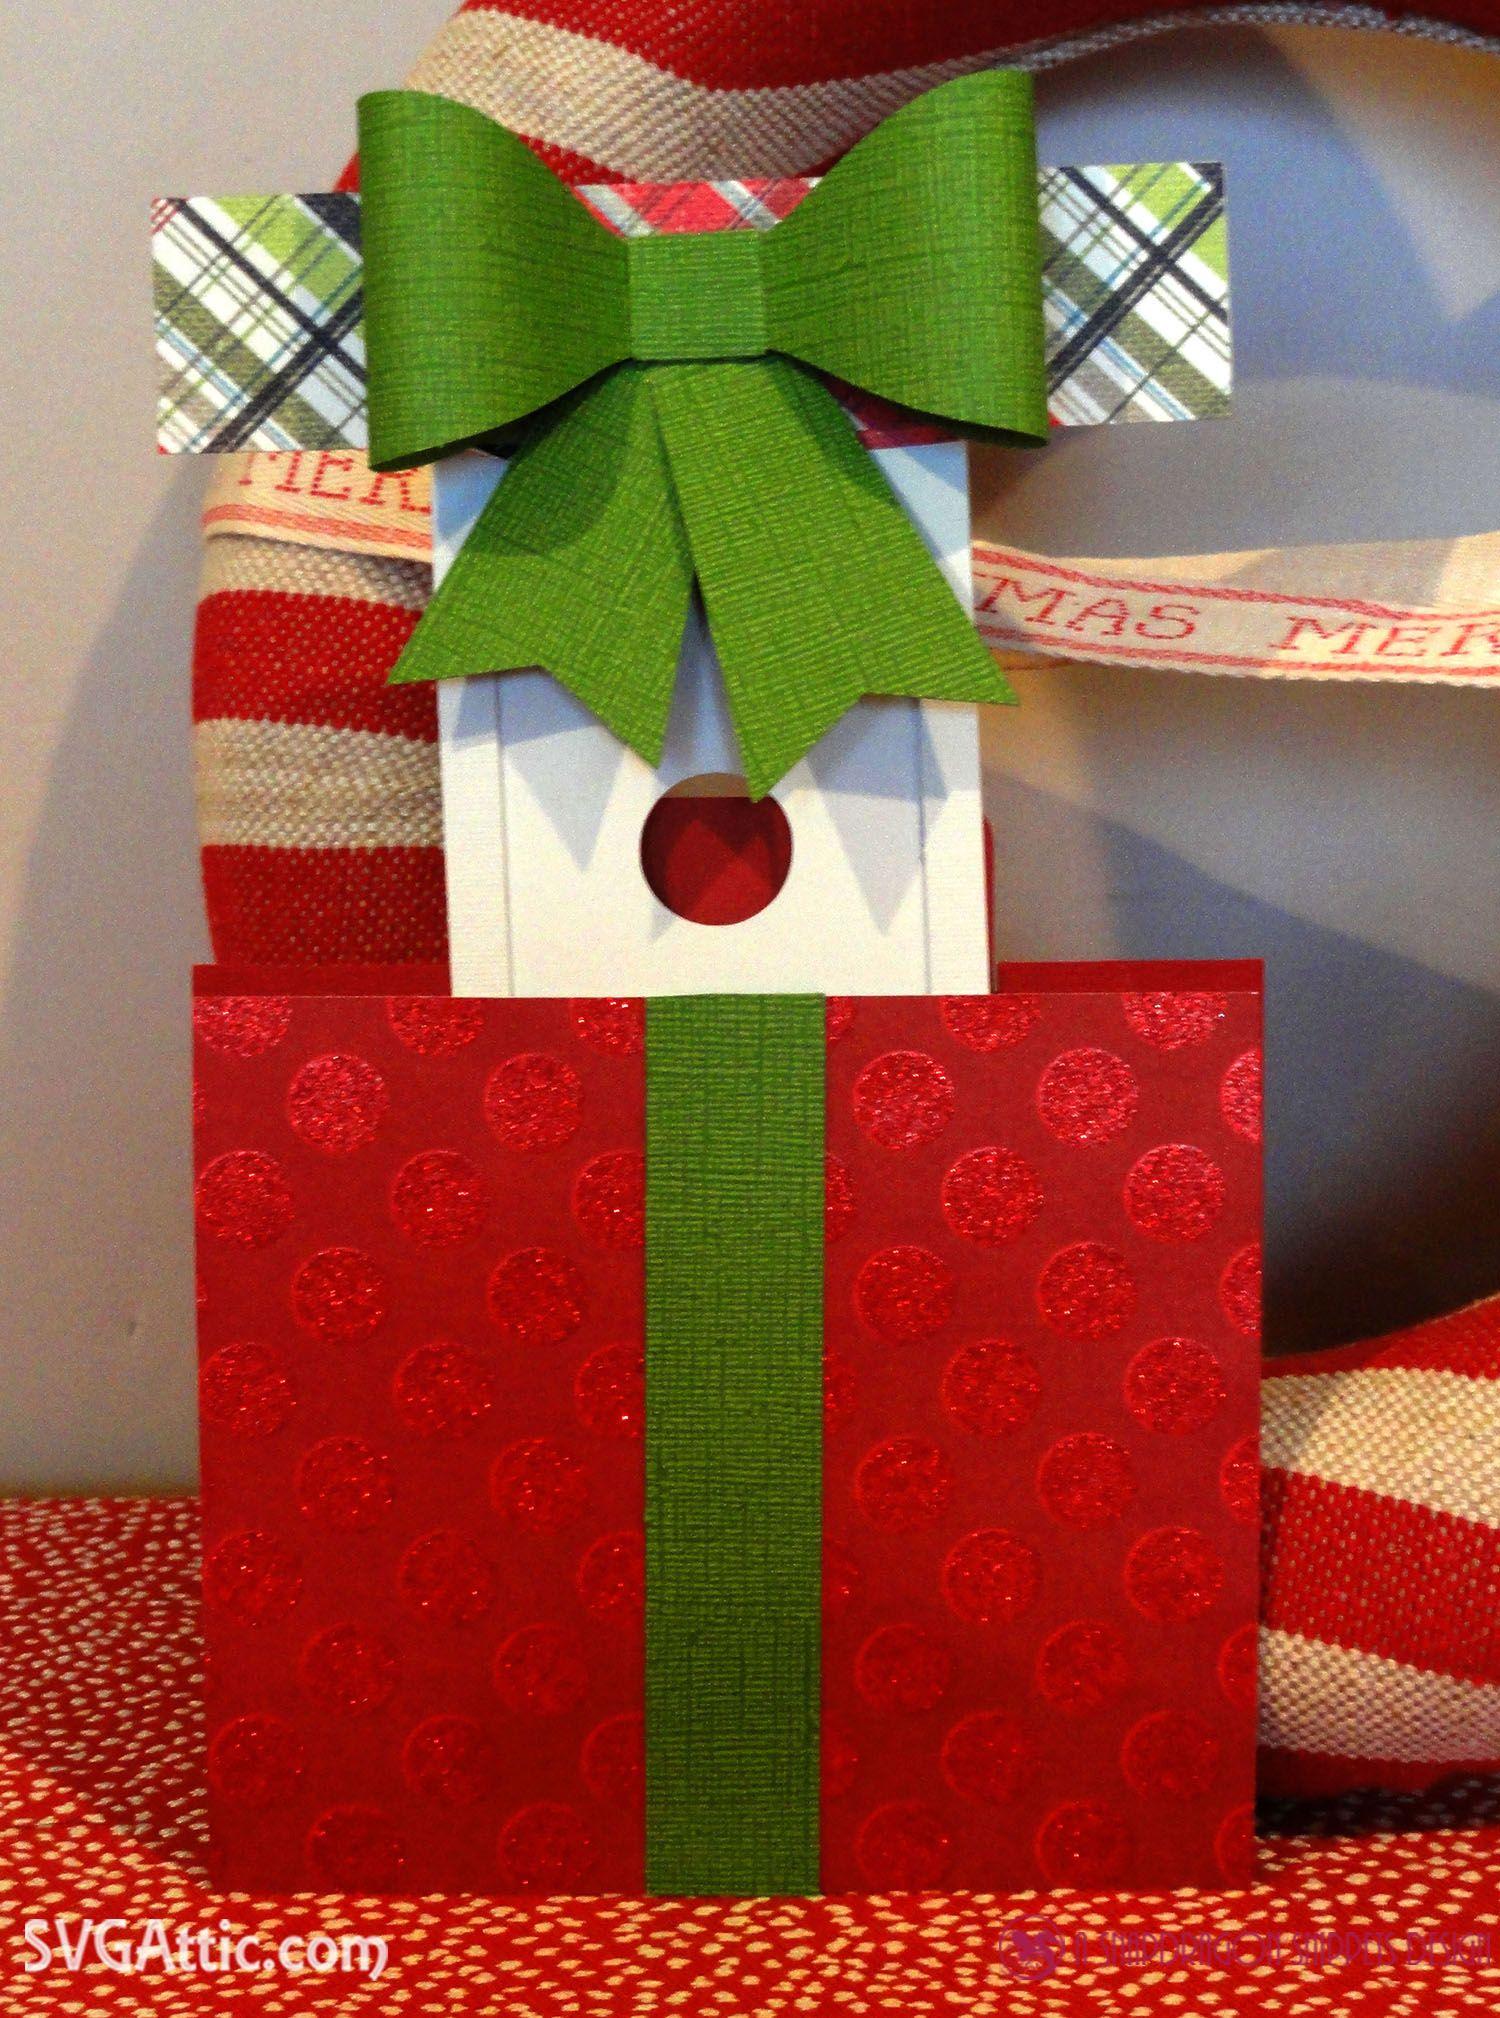 Present hidden gift card holder from JGW Ho Ho Holiday set